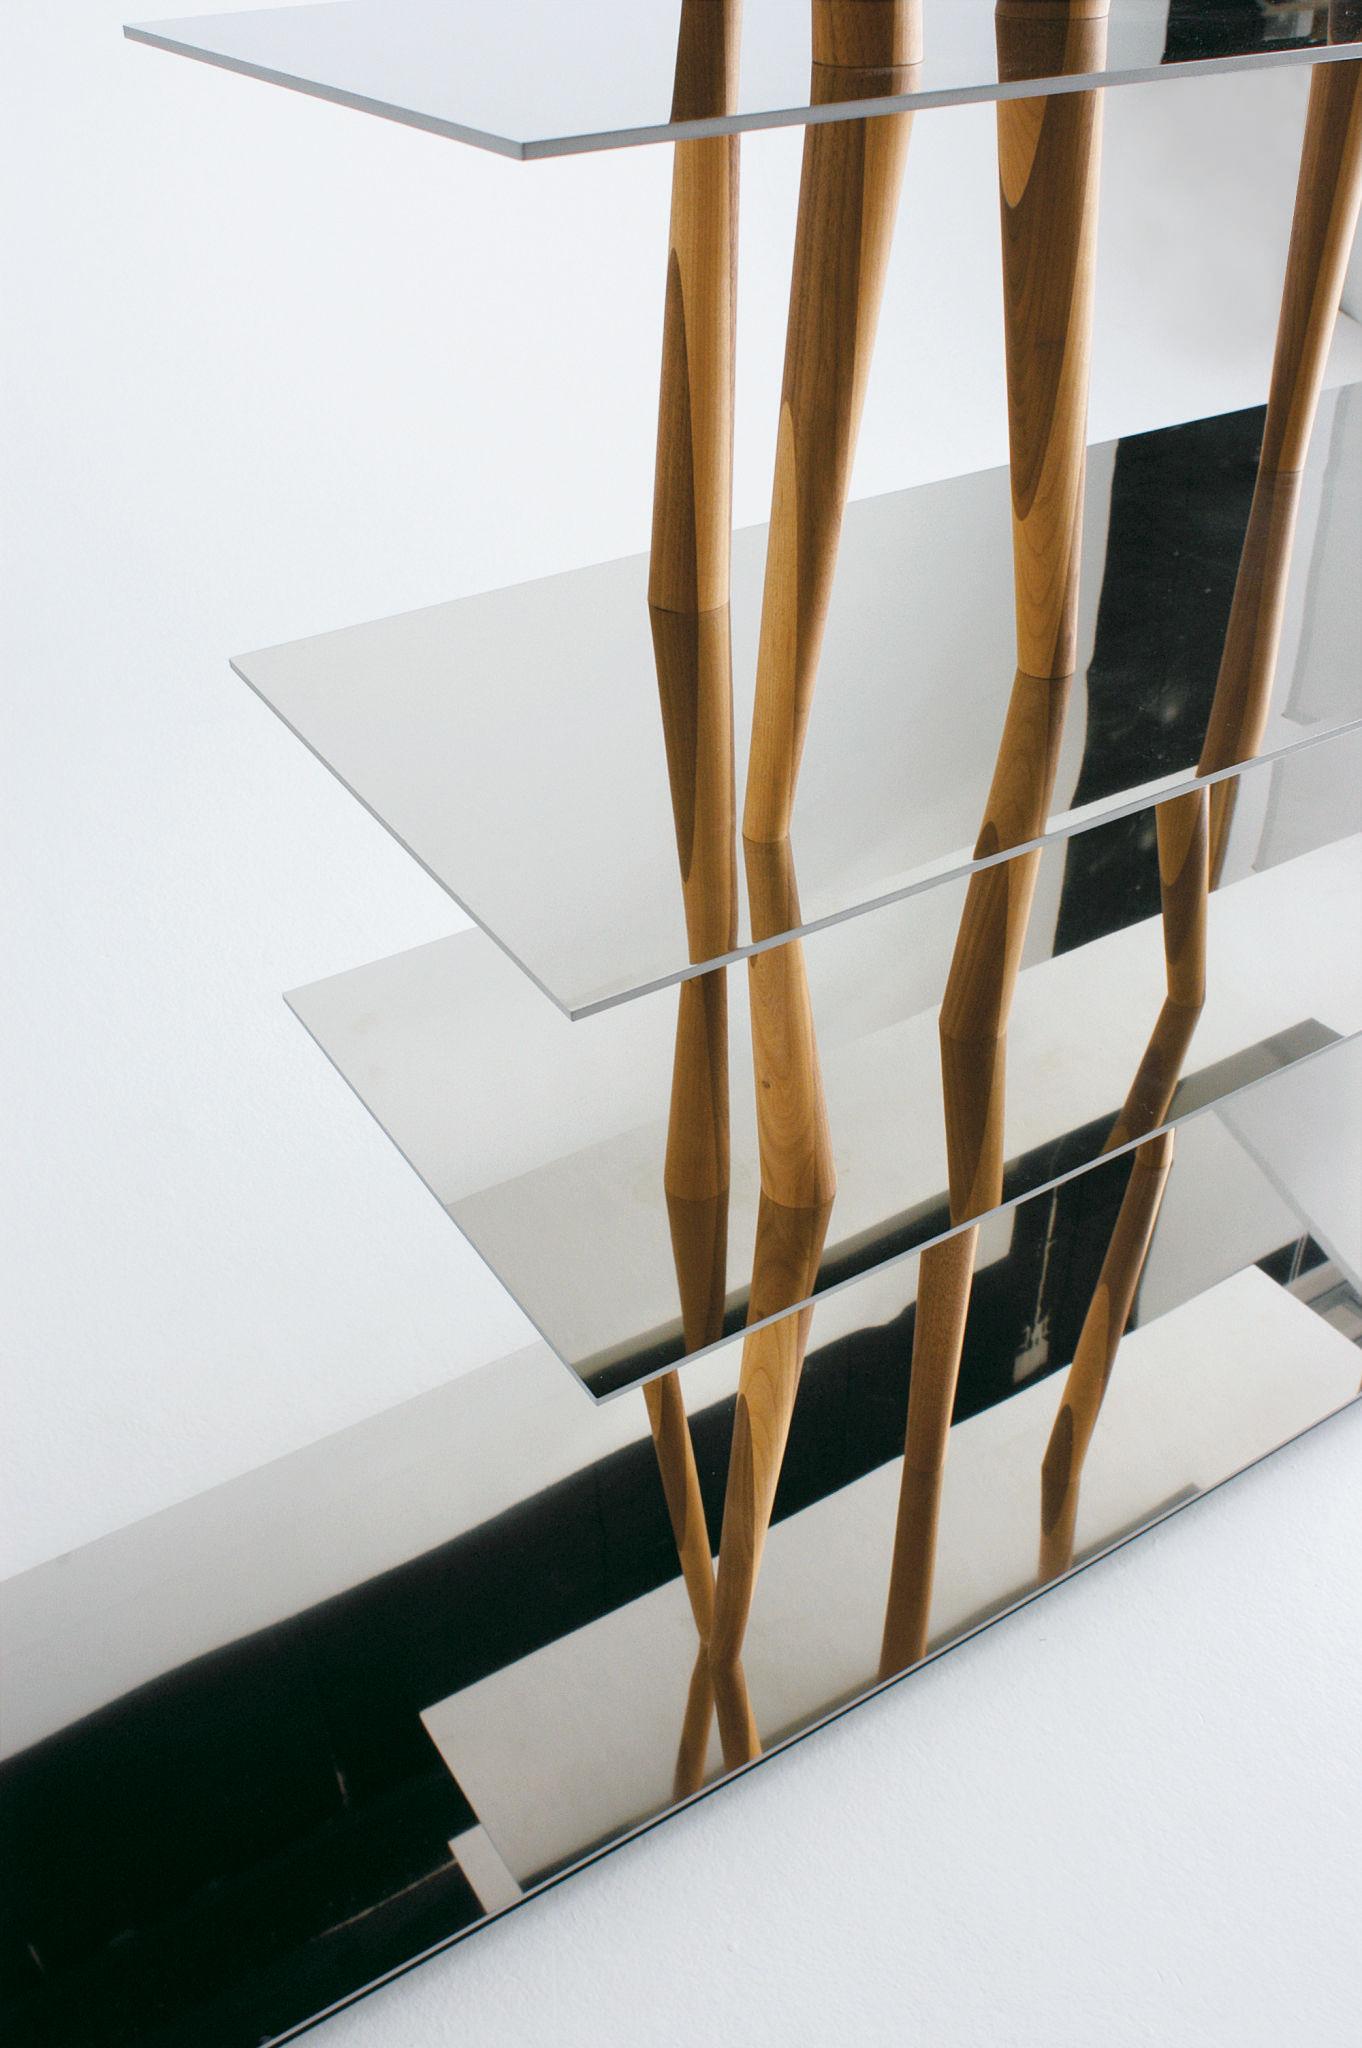 NaturalemetalloMade Horm Sendai Di Design In Scaffale Legno CEQeBoWrdx